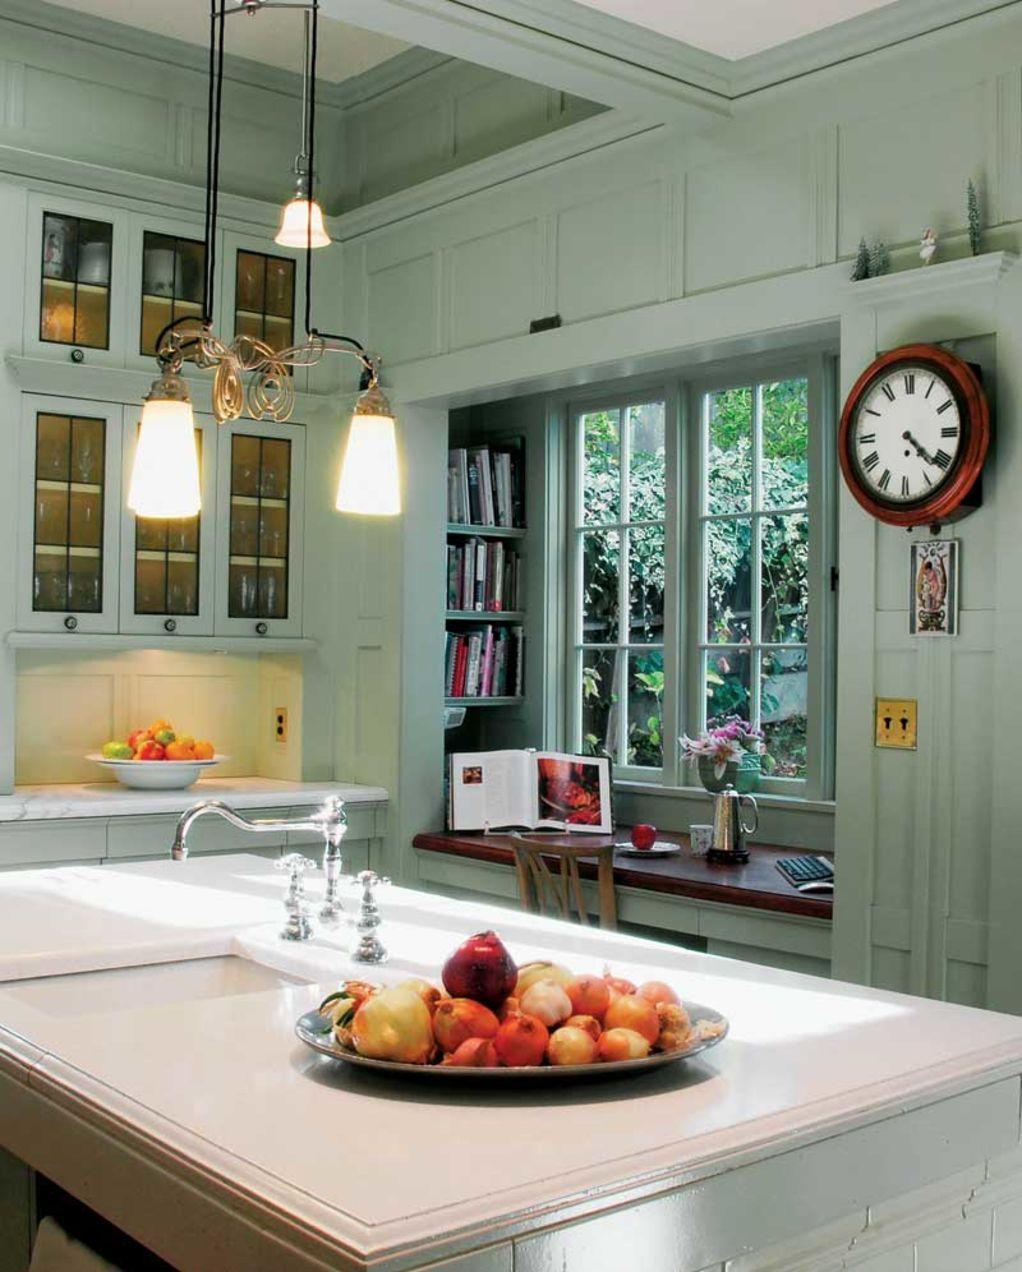 Period Kitchens Designs Renovation: A Classic Kitchen For An Edwardian Renovation